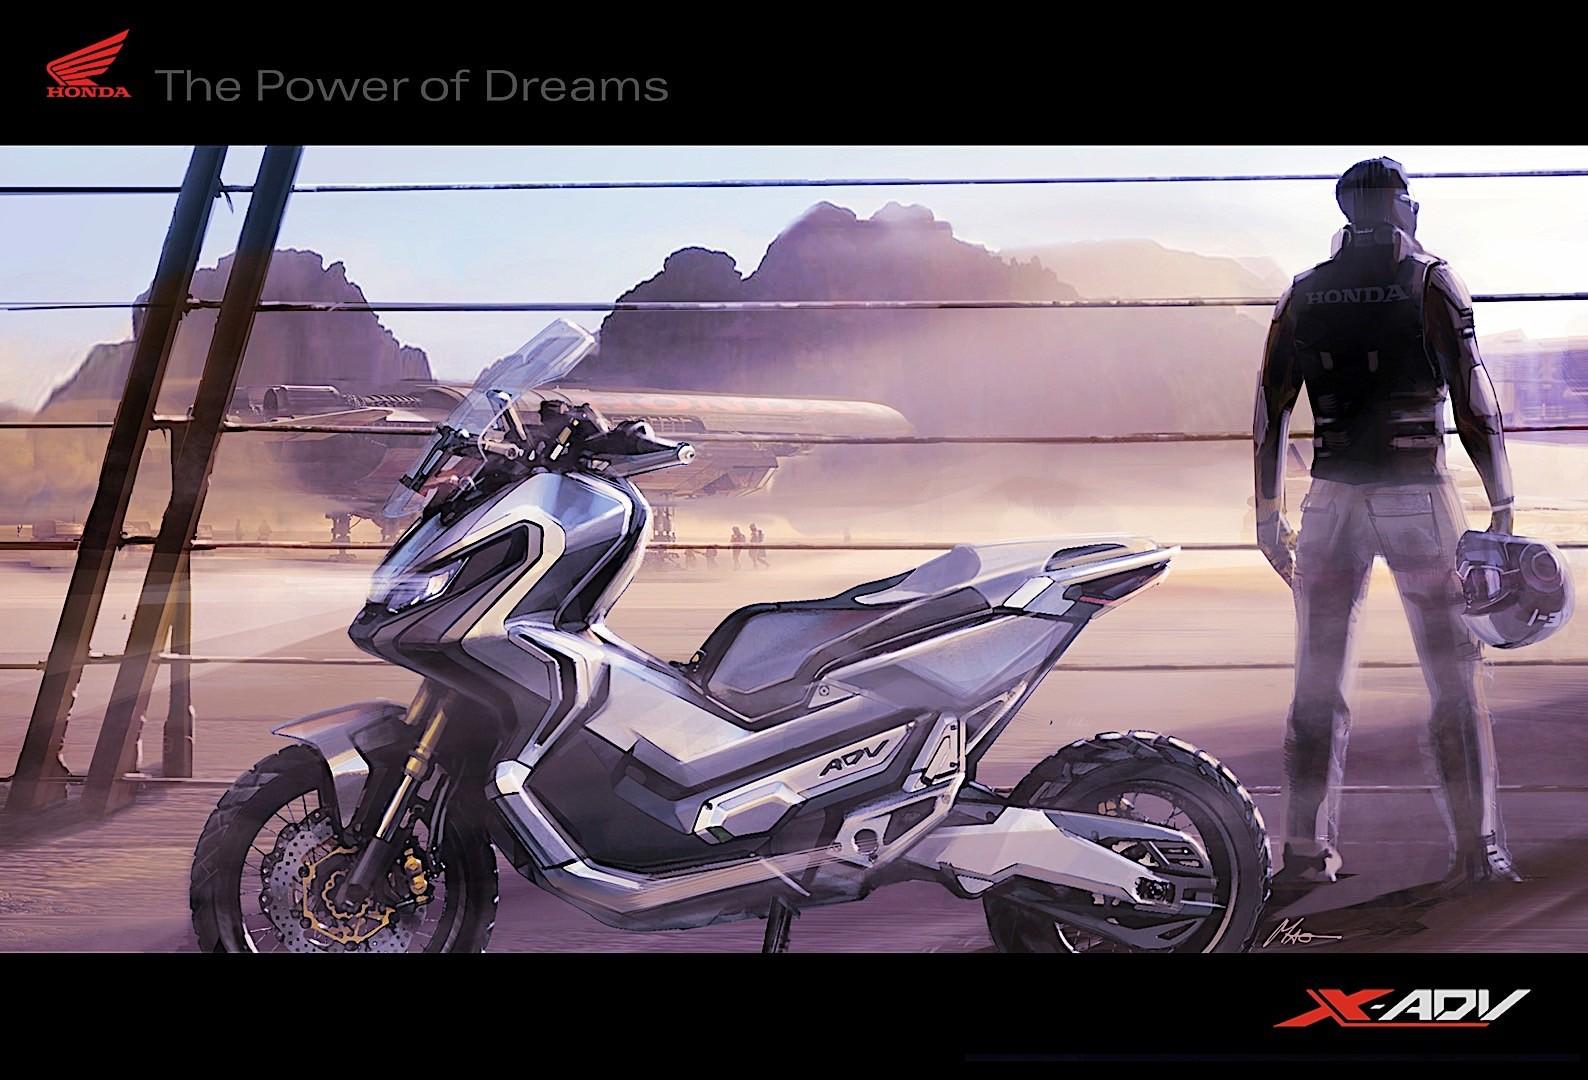 Honda X-ADV 2017 tervek